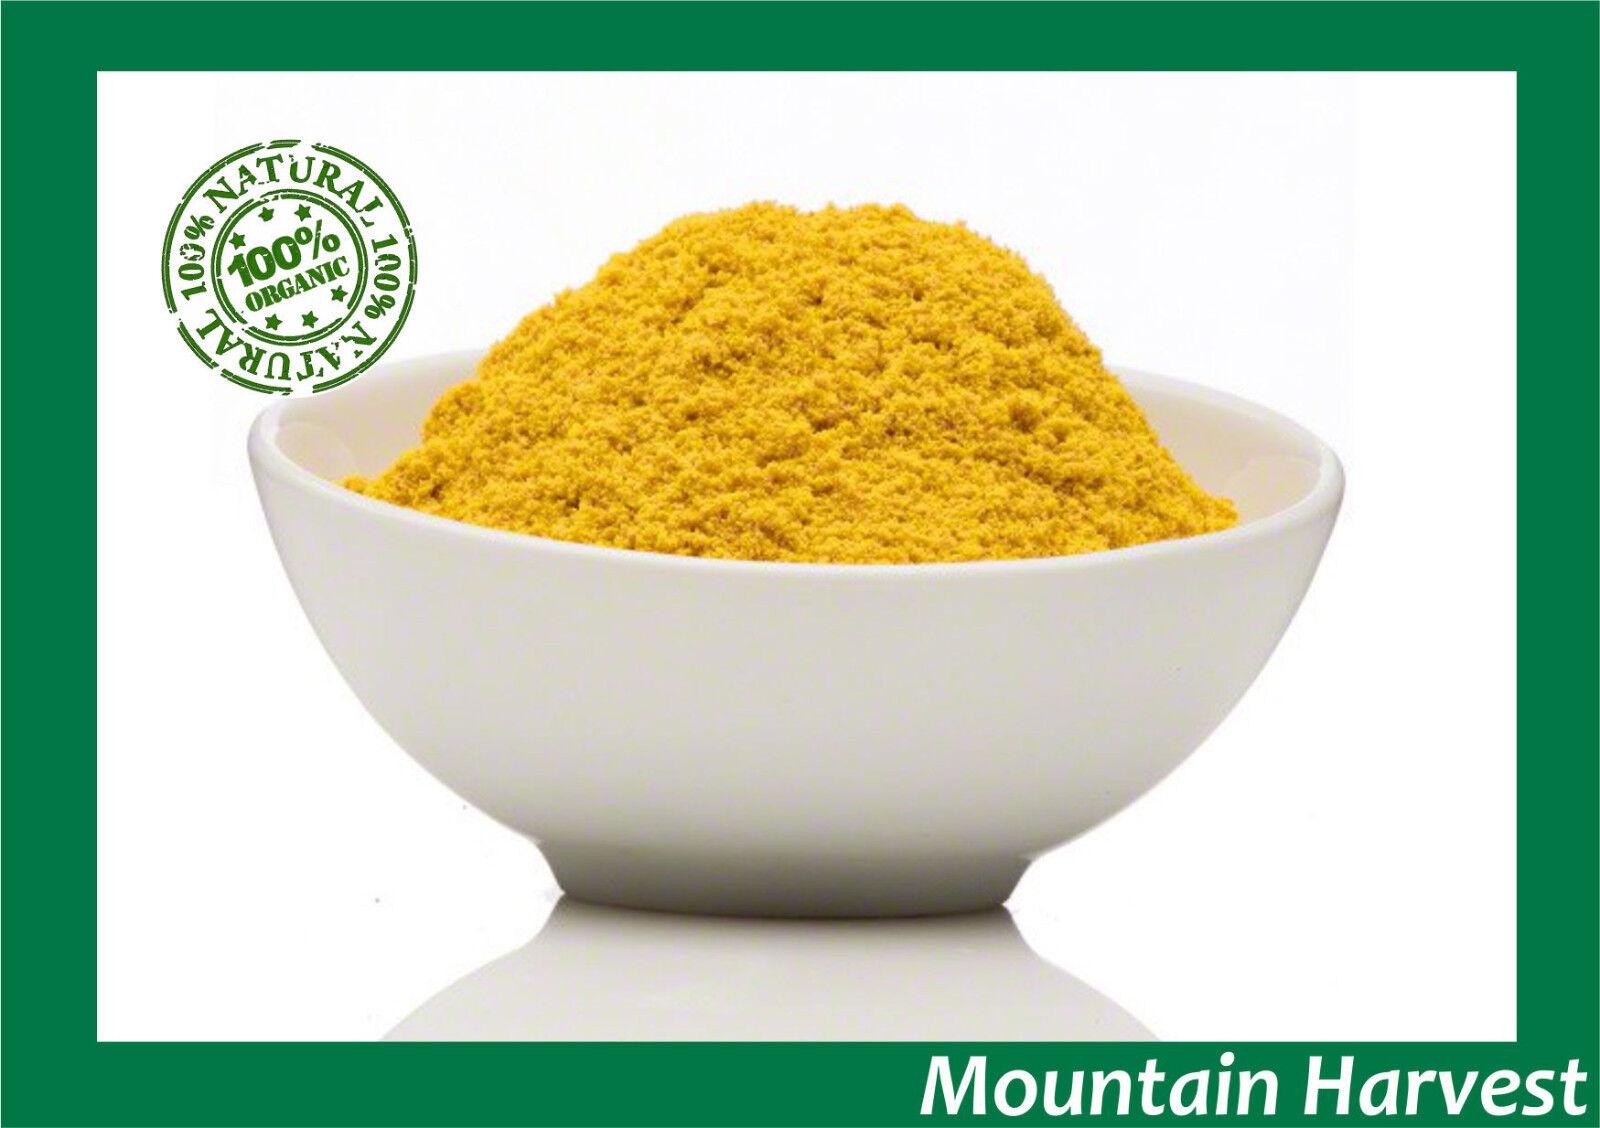 100% PURE ORGANIC BEE POLLEN POWDER 1 2 4 6 8 12 OZ   FRESH &  GLUTEN FREE